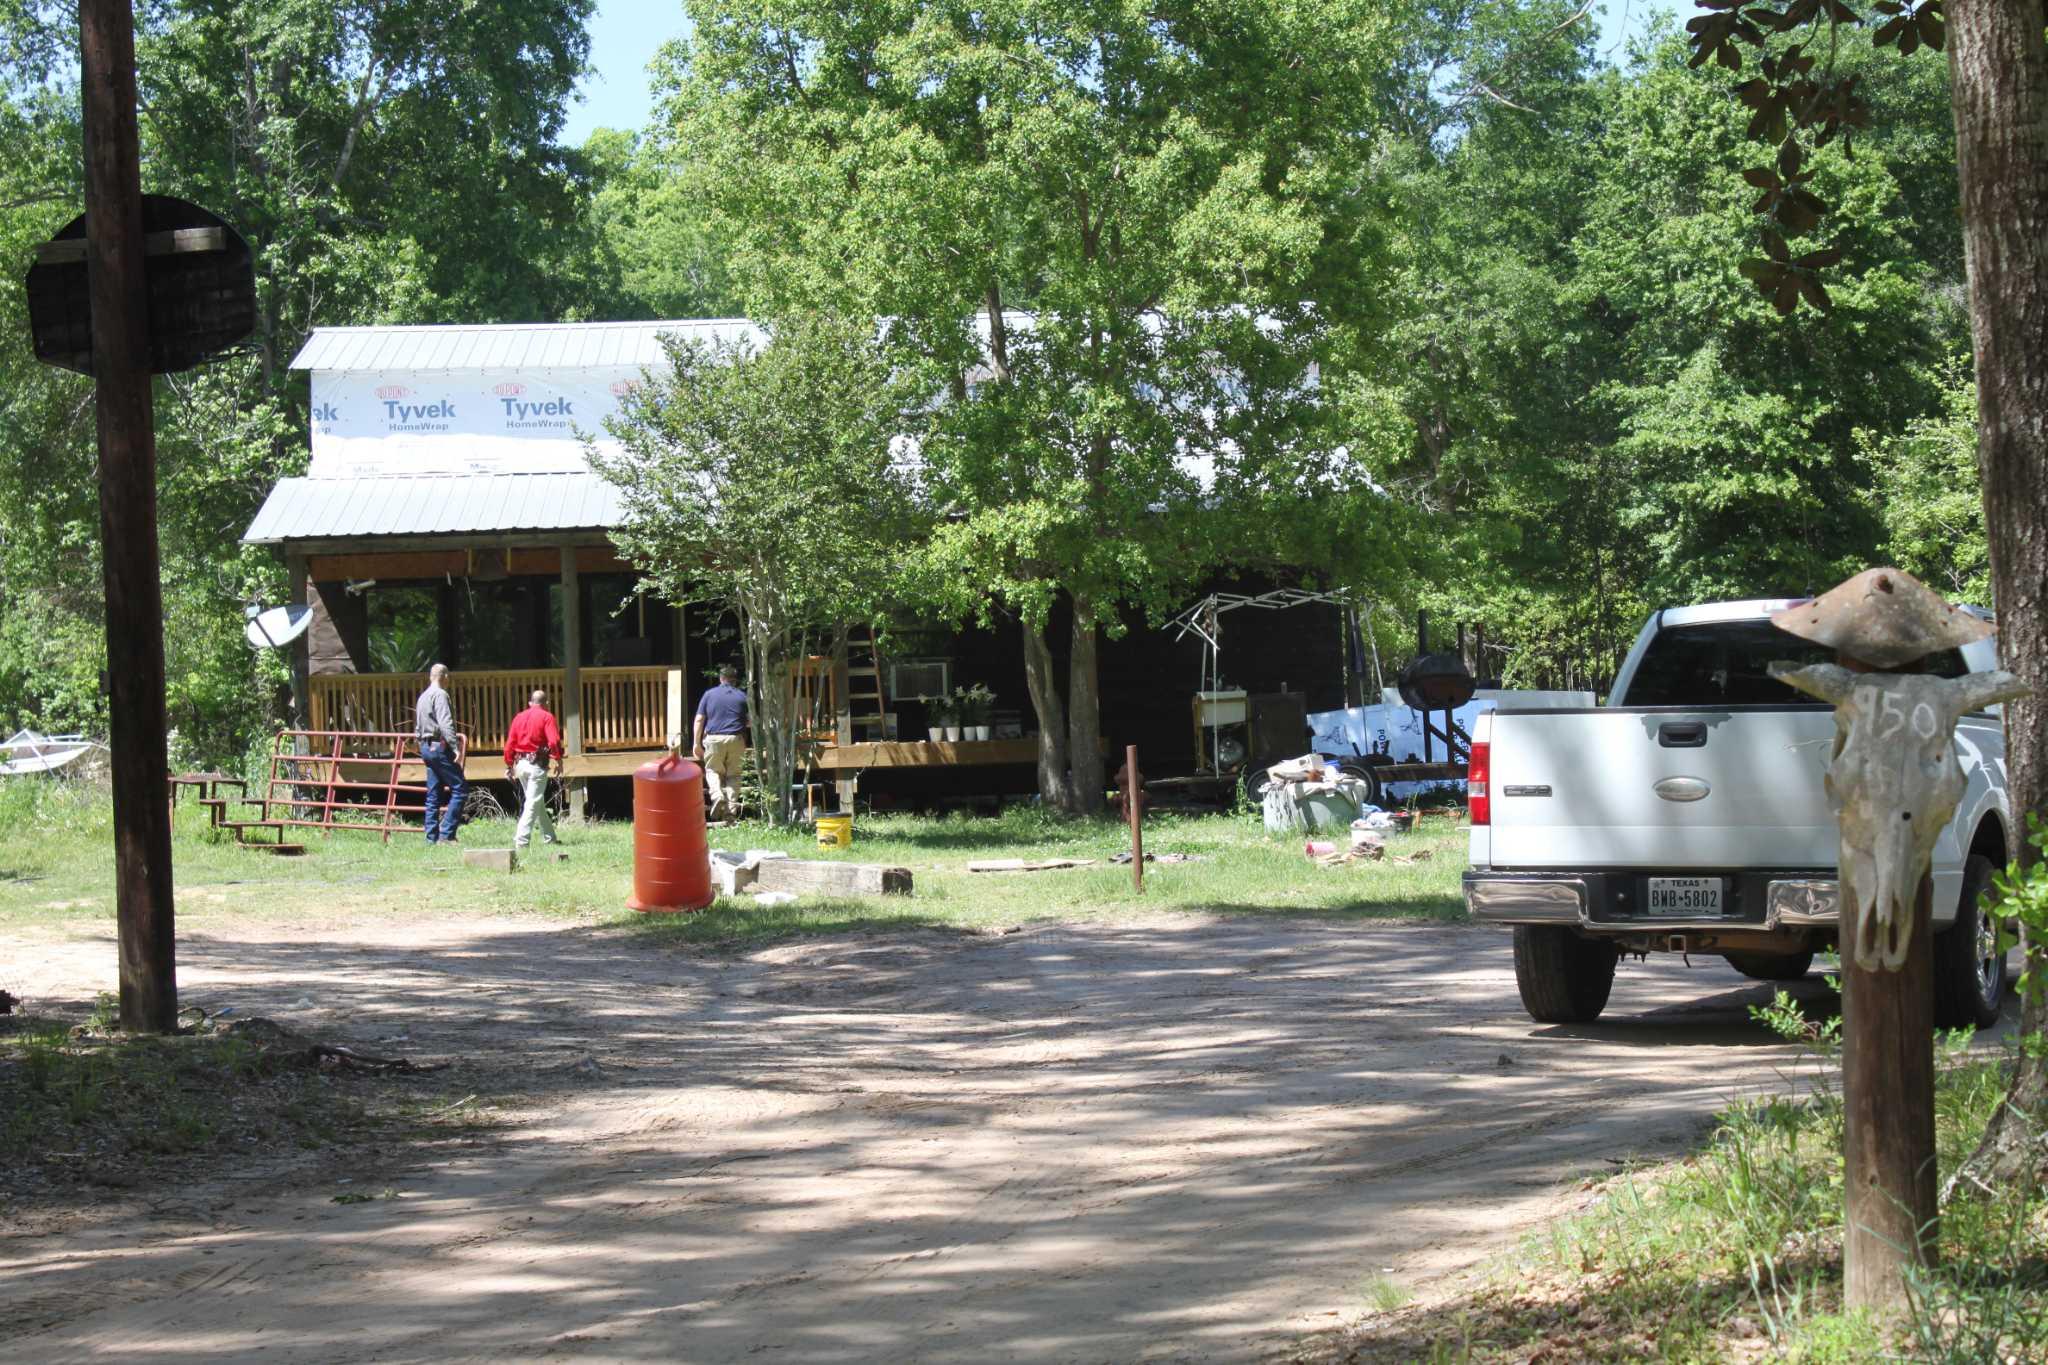 Investigators seize camper, more evidence in Shepherd child porn case - Houston Chronicle